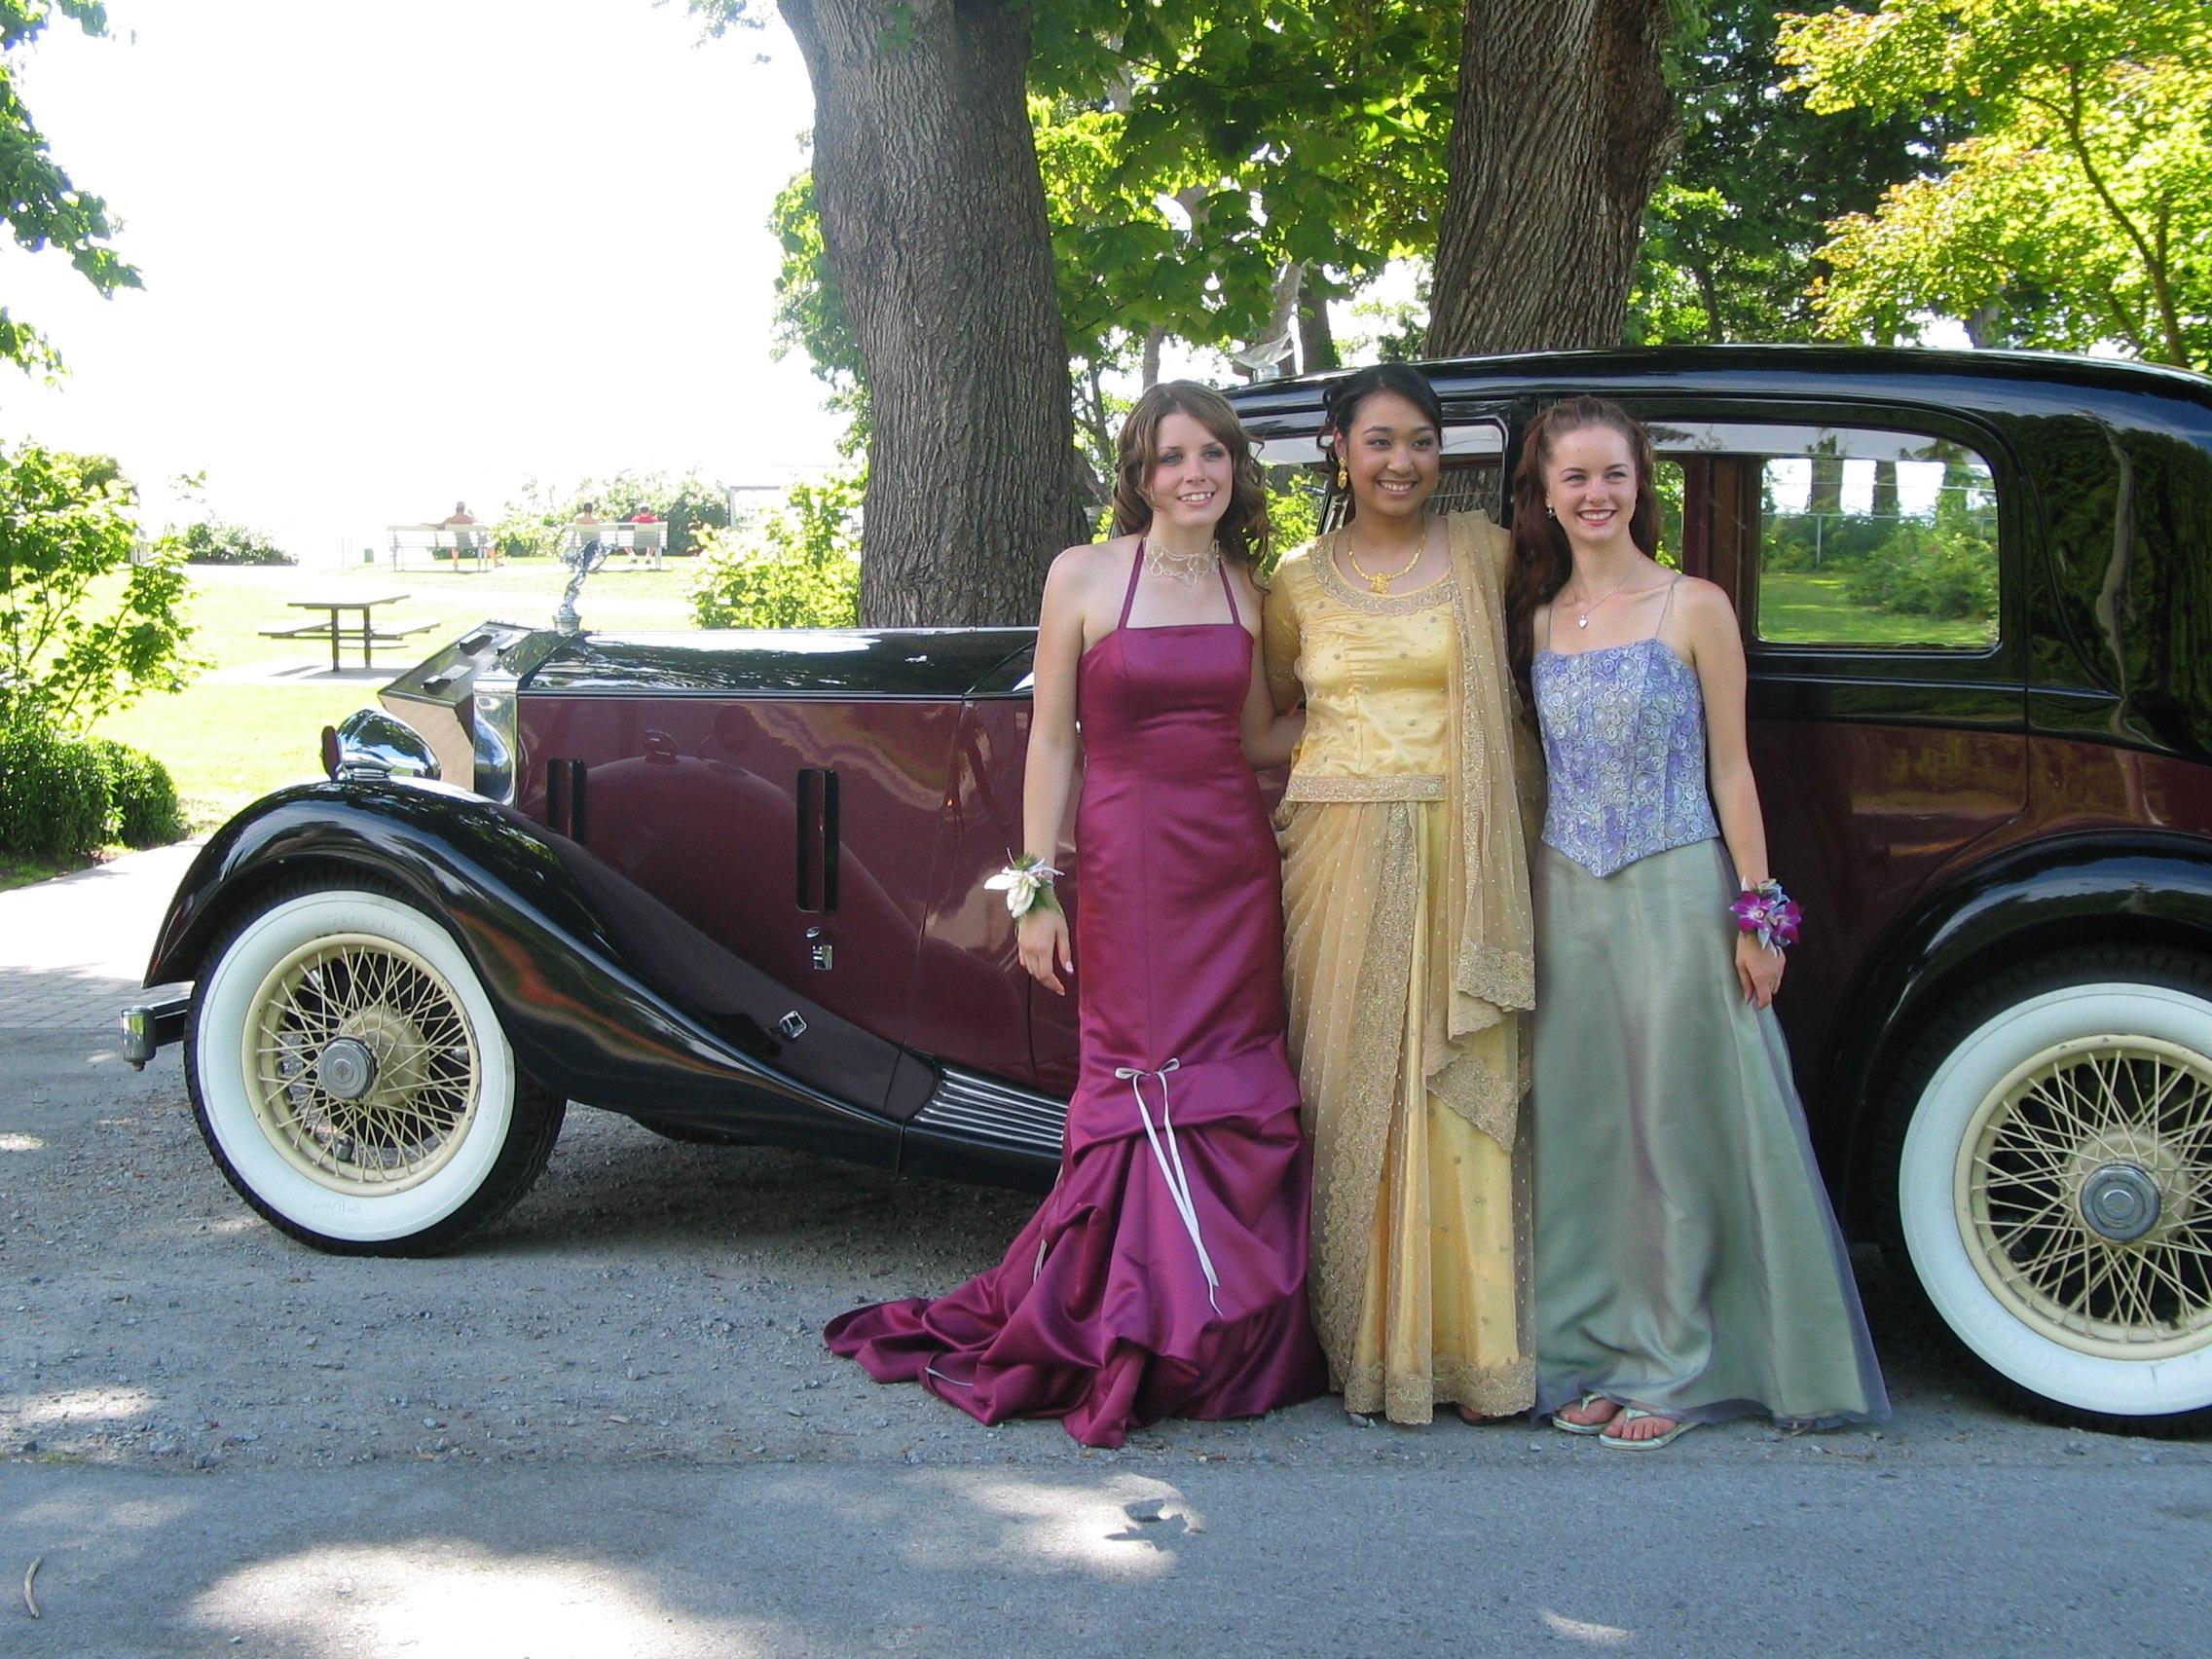 Vancouver prom graduation vintage rental car